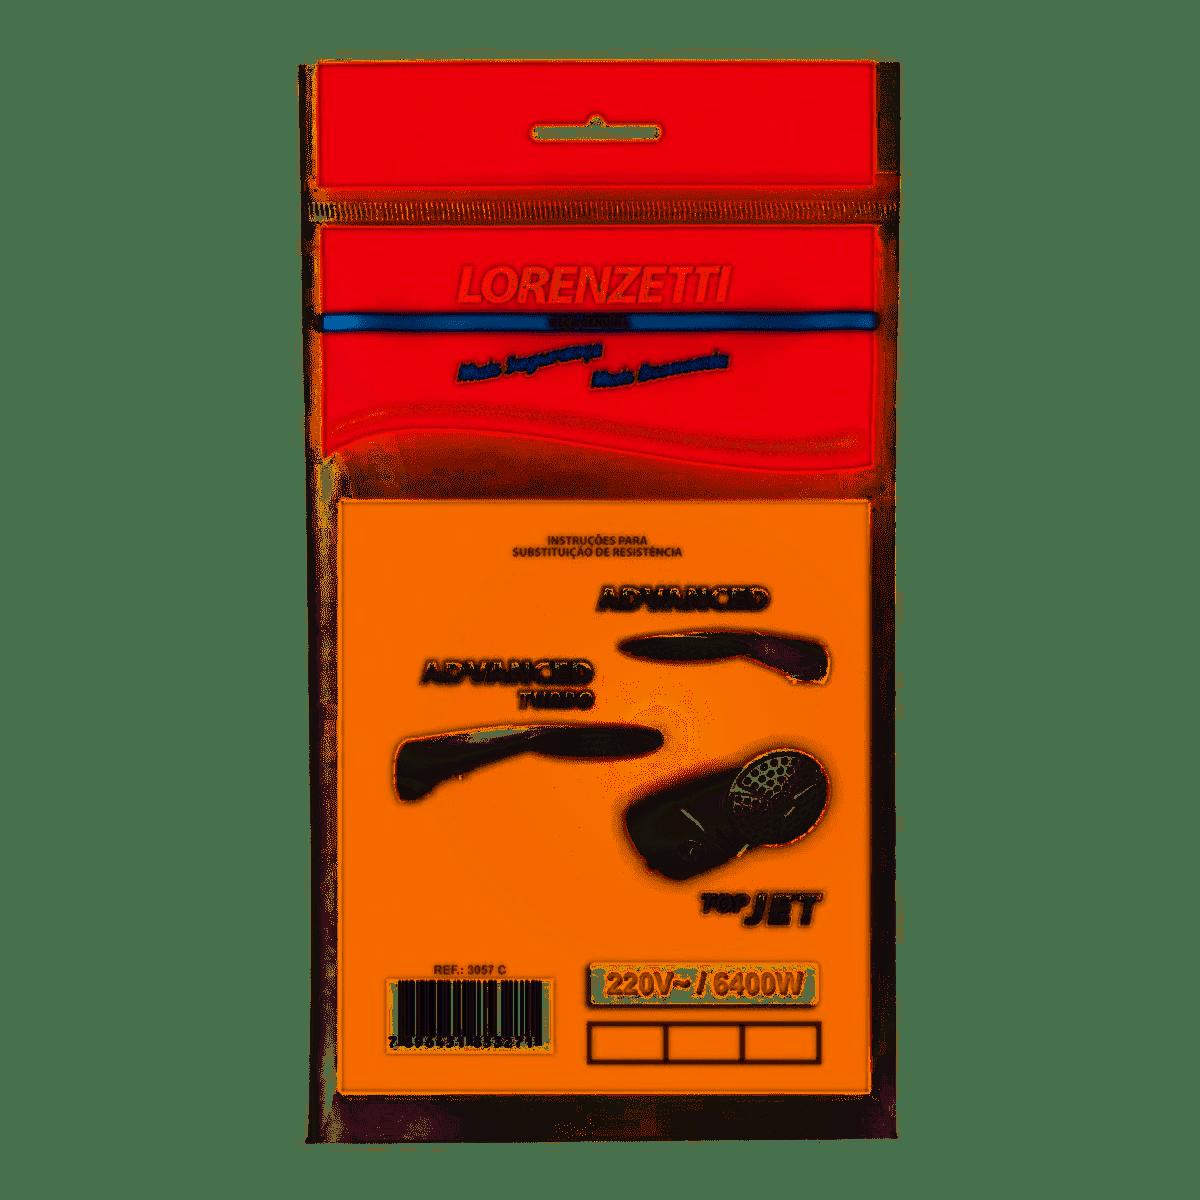 RESISTÊNCIA MULTI. ADVANCED/ADVANCED TURBO/TOP JET/TOP JET TURBO 220V 6400W - LORENZETTI